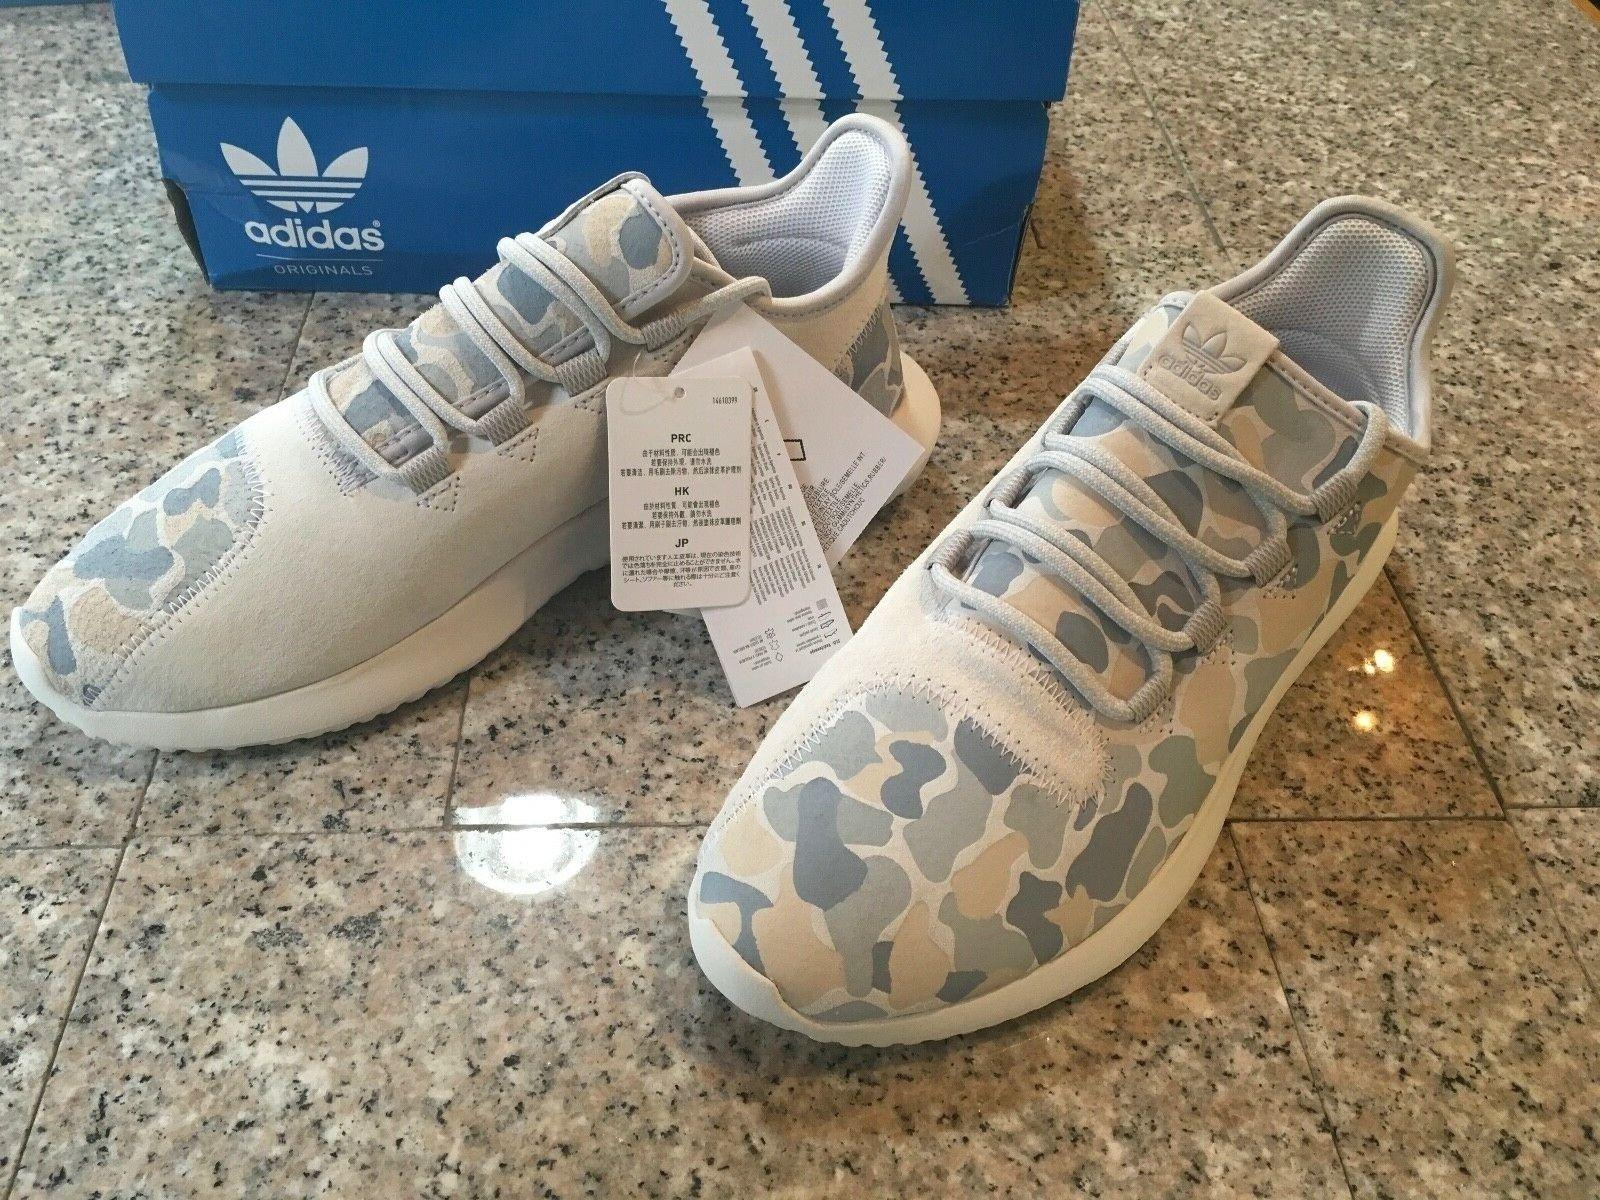 ADIDAS Originals TUBULAR SHADOW BB8817 Suede Camo Vintage White NEW Sneakers 9.5